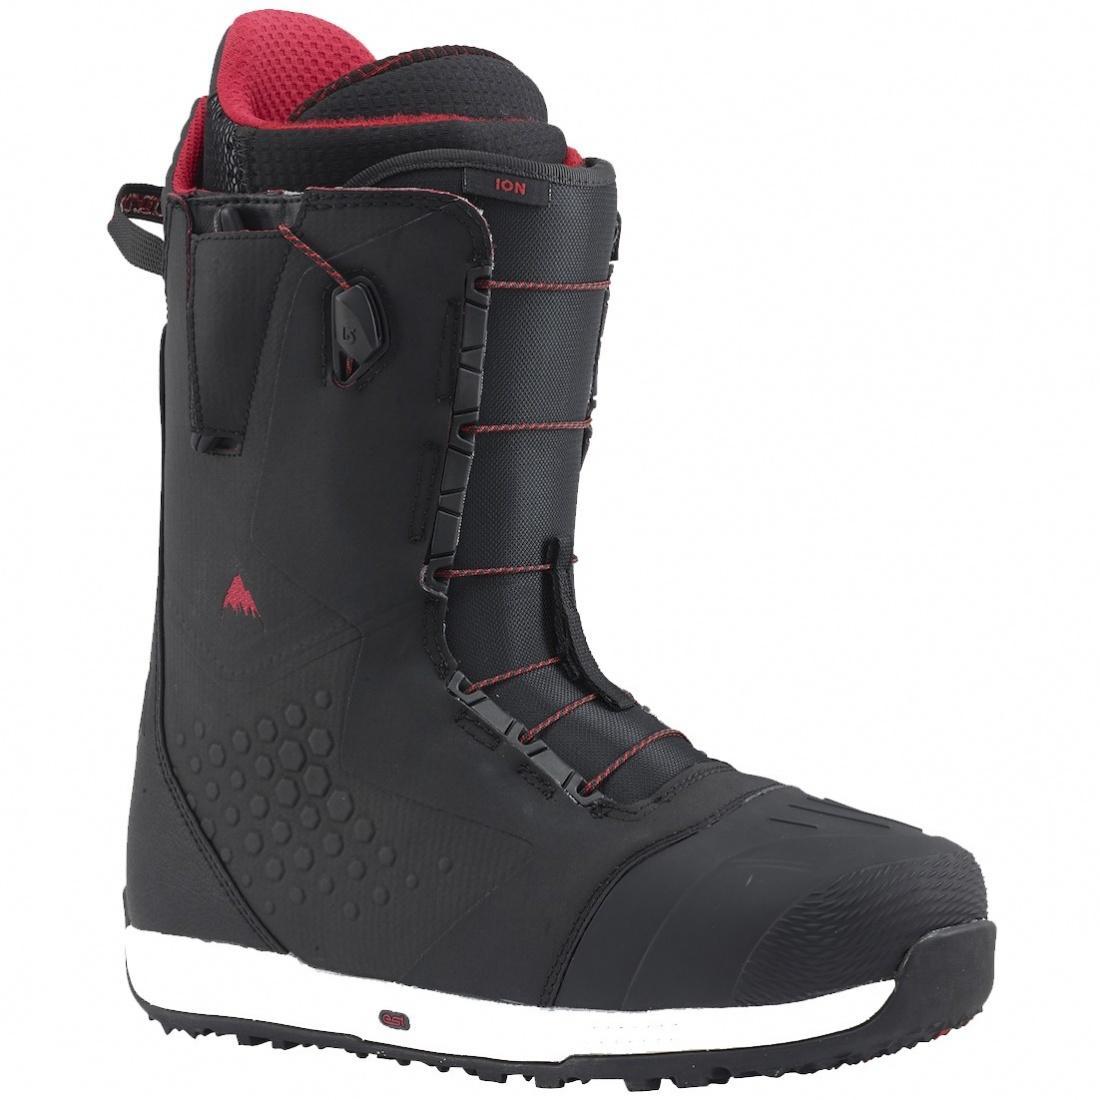 Ботинки для сноуборда Burton ION Black/Red 10